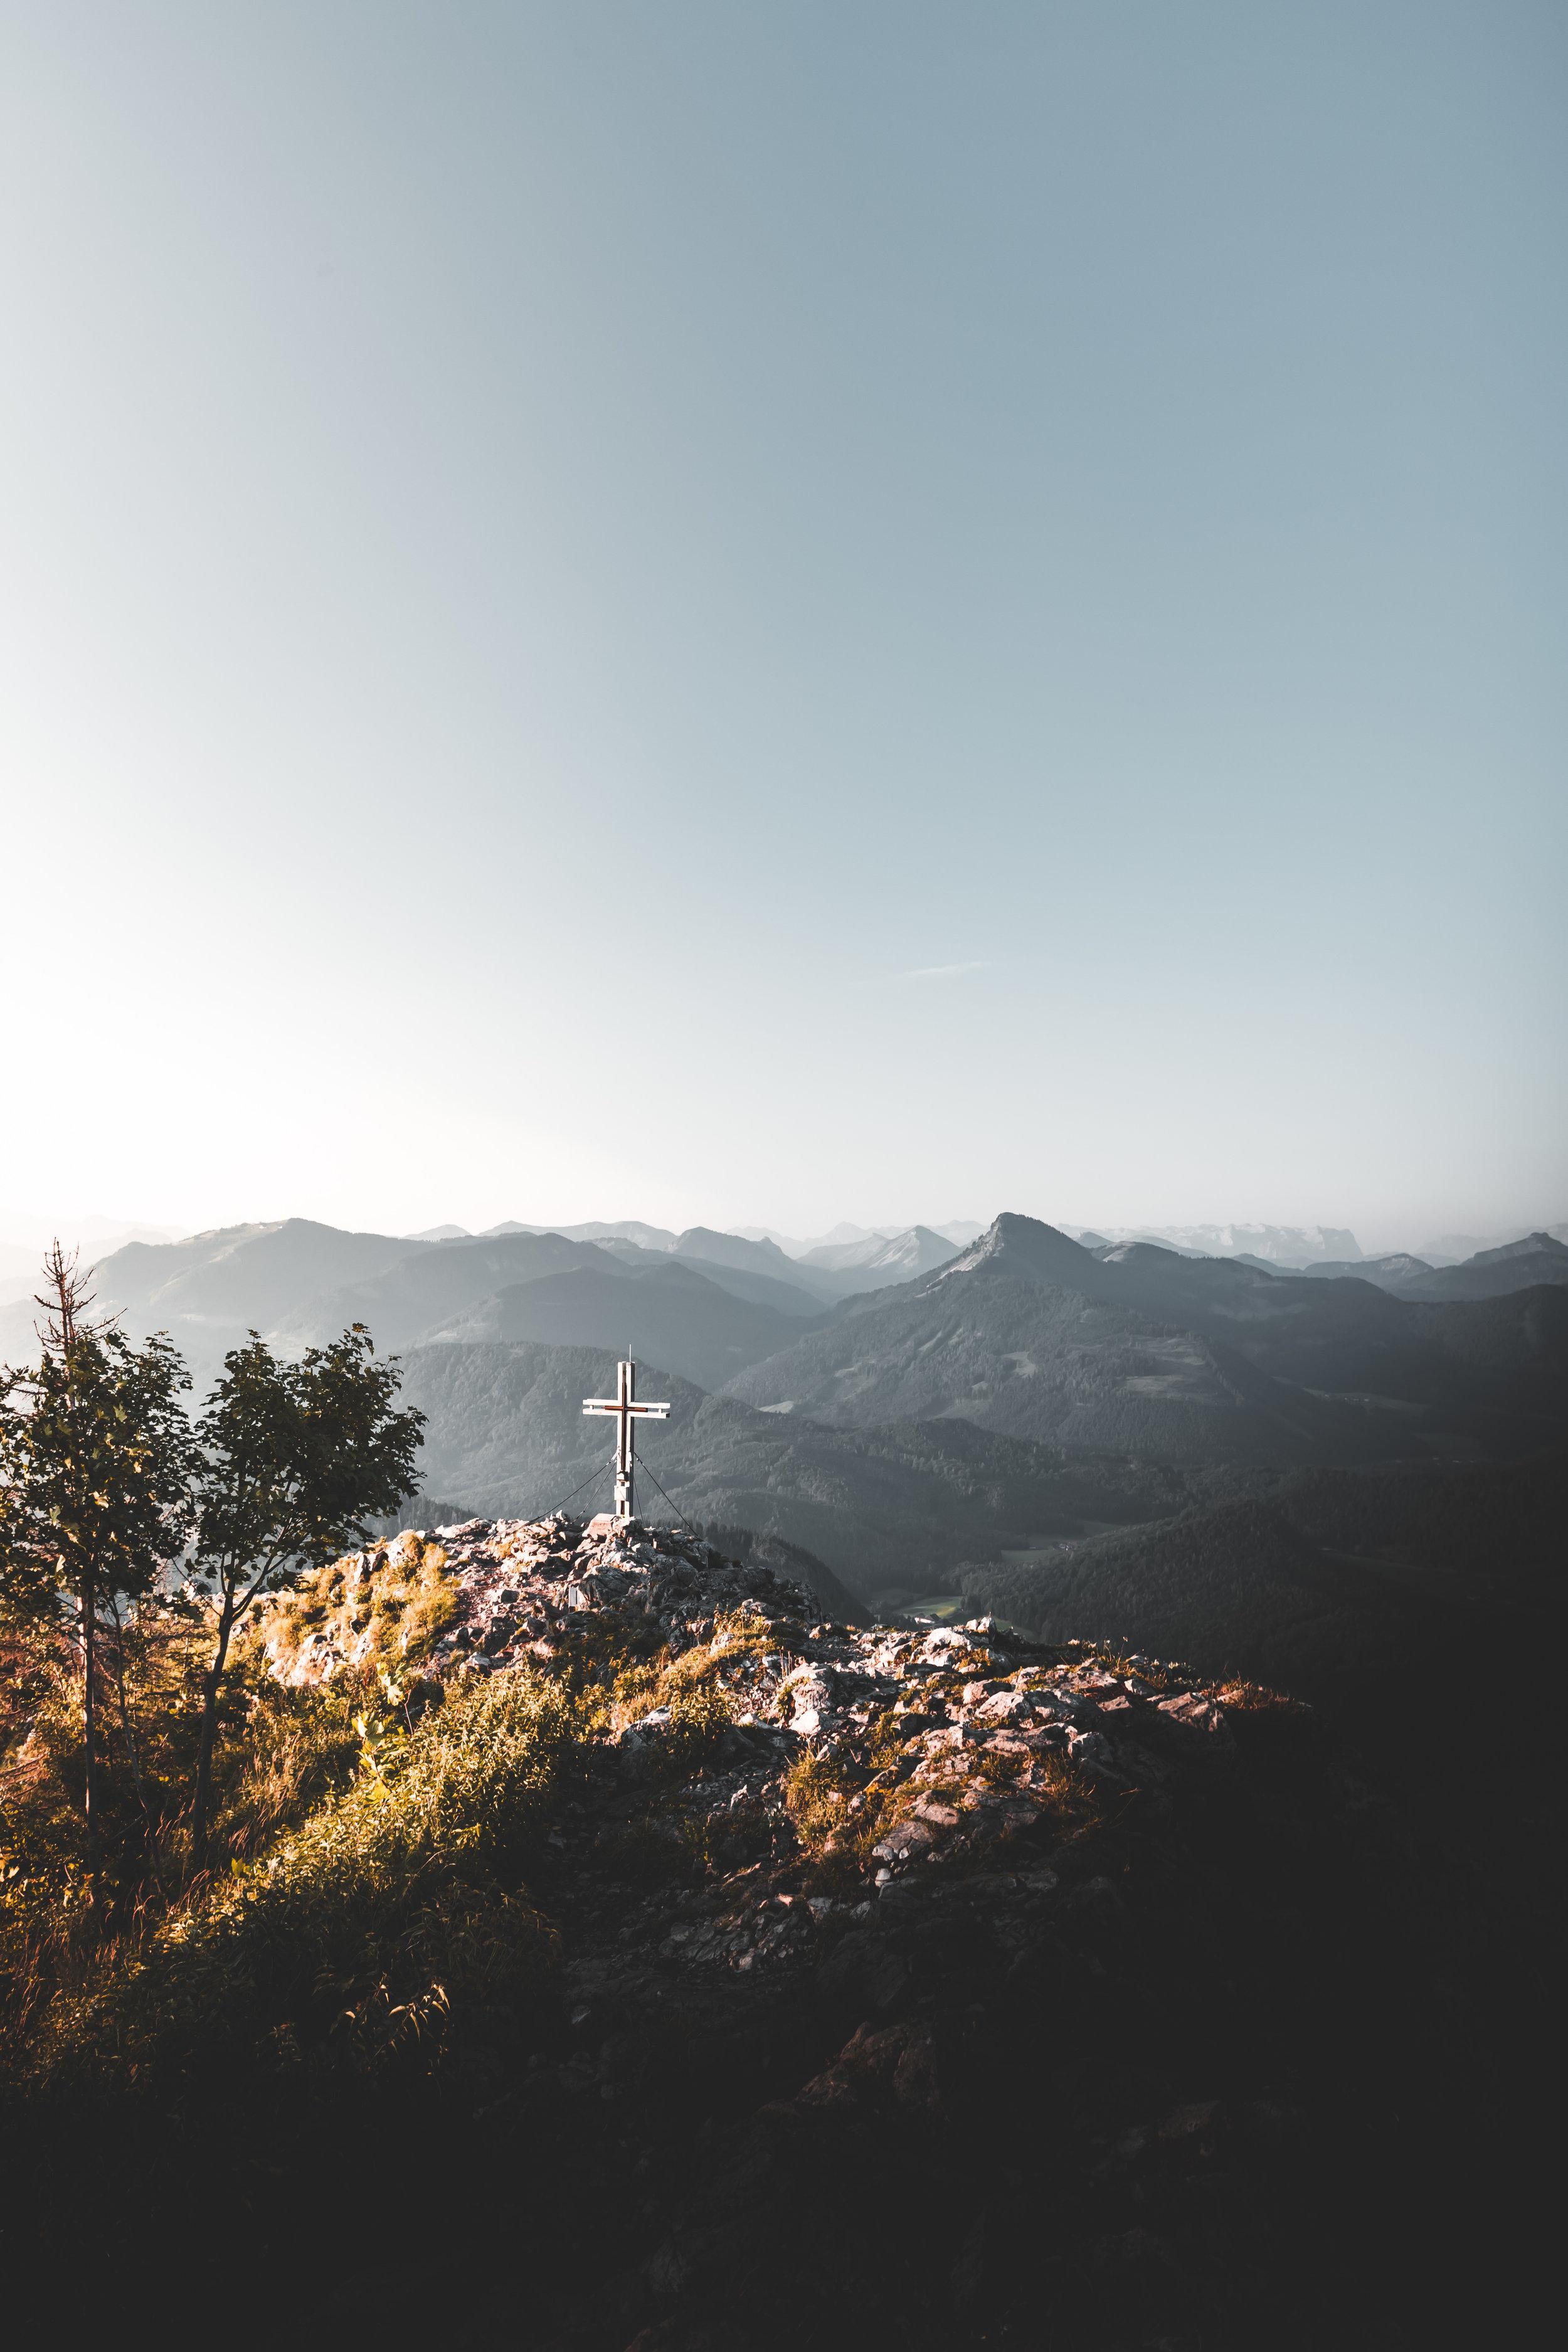 September 1, 2019 - Sermon- Doug Allison